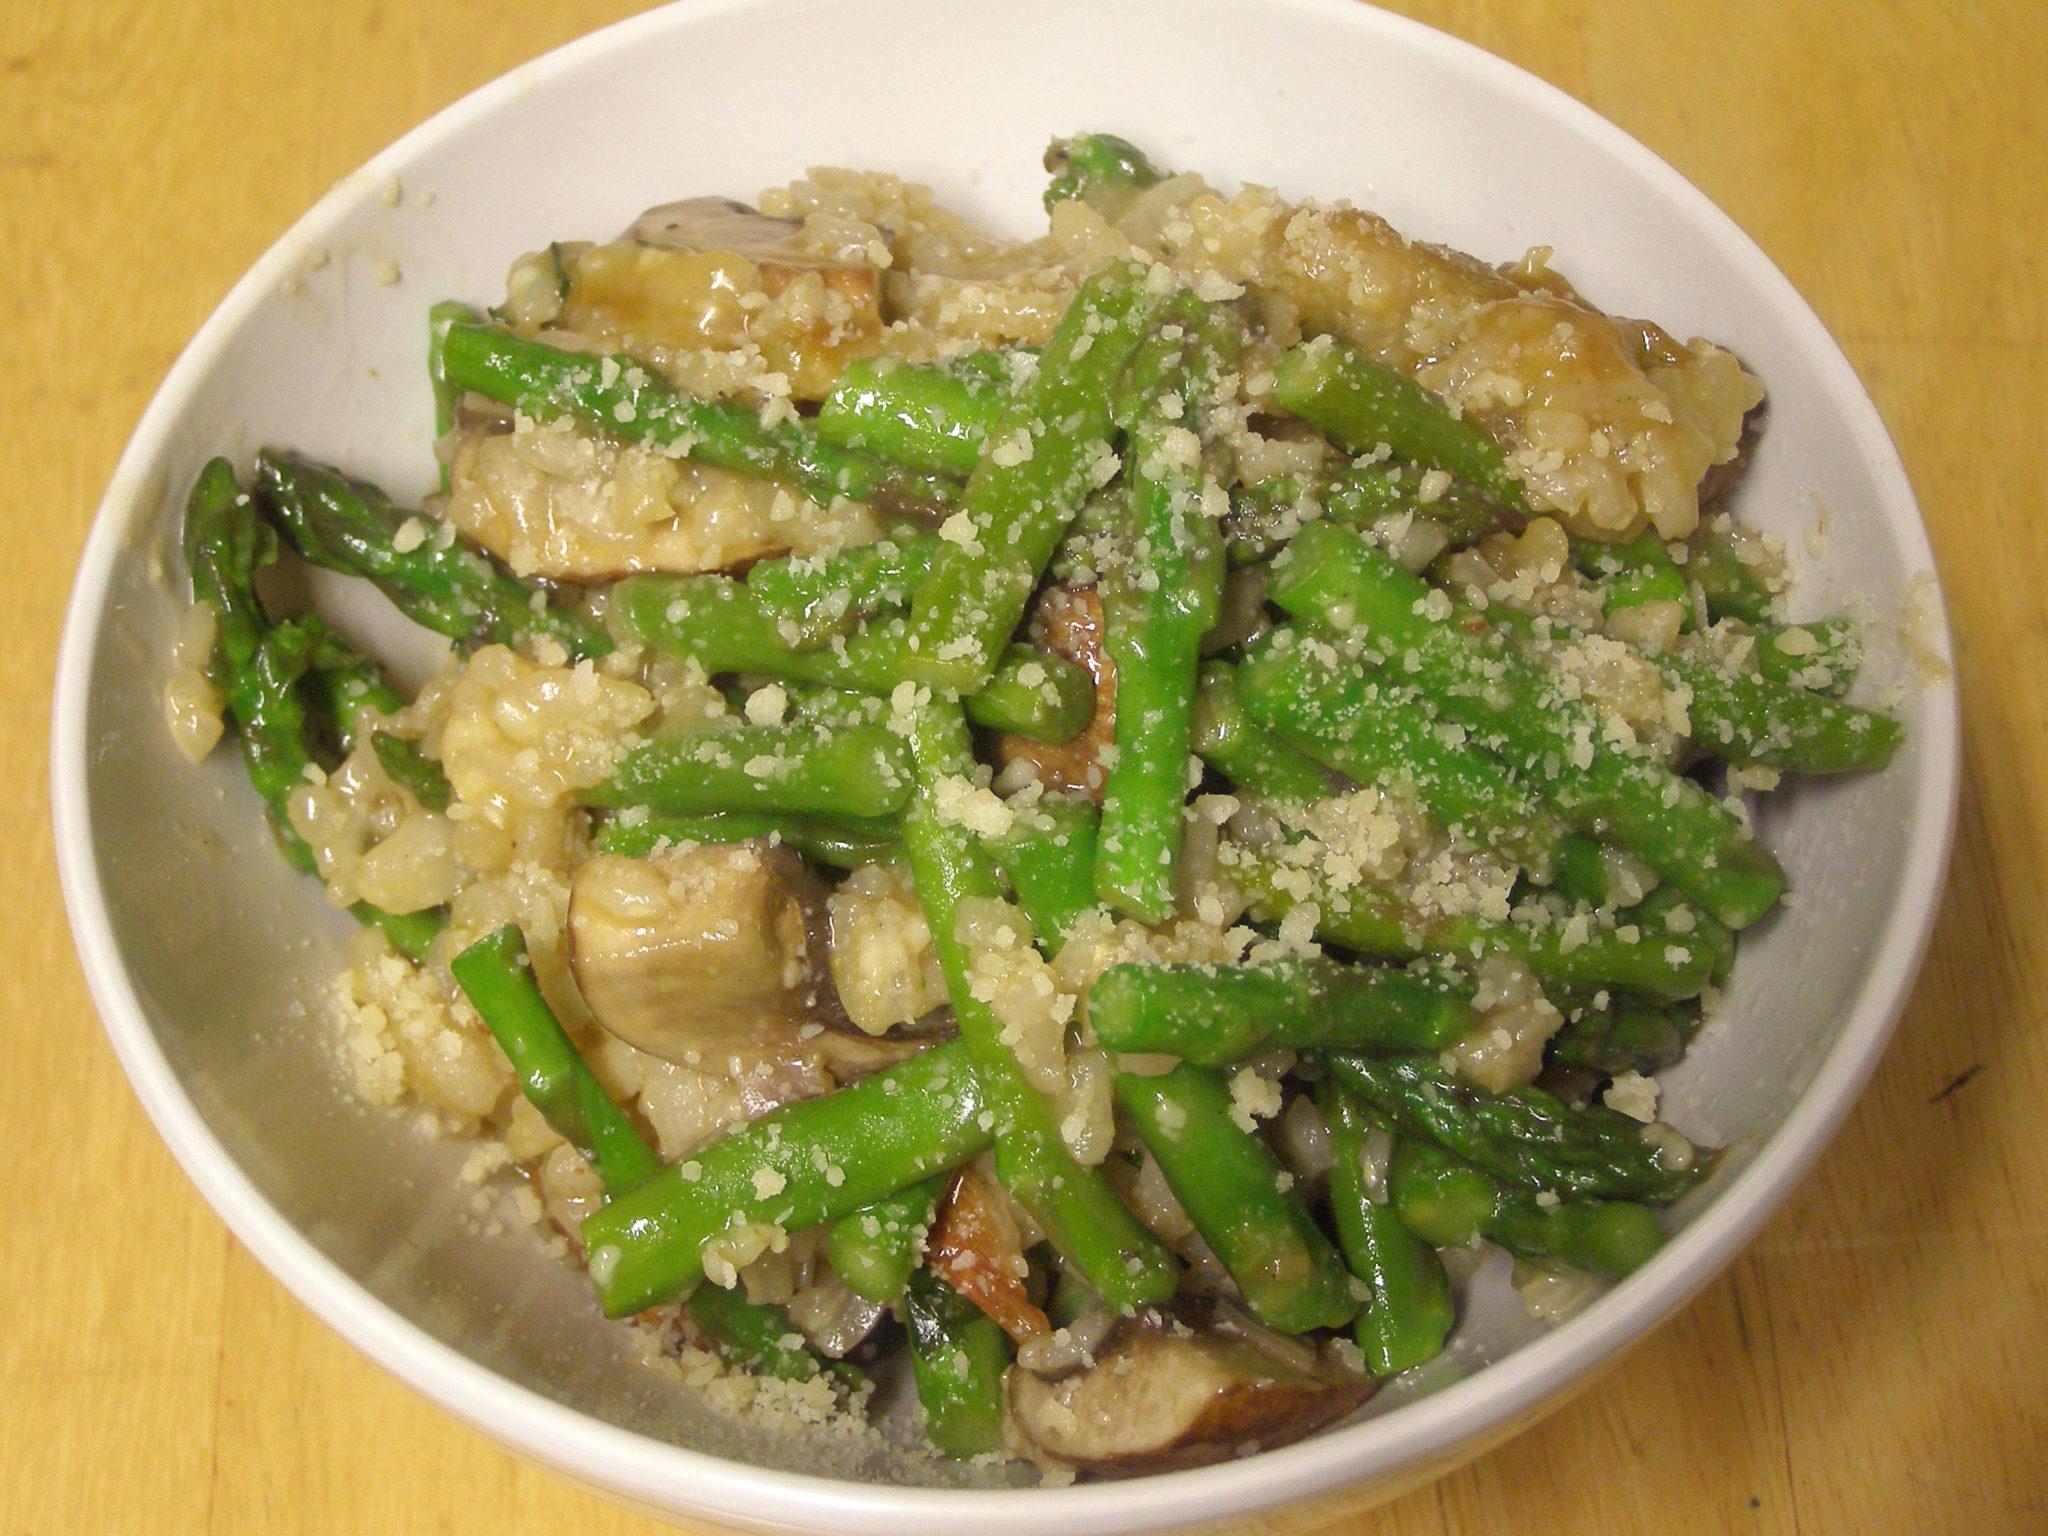 Asparagus-Mushroom Risotto